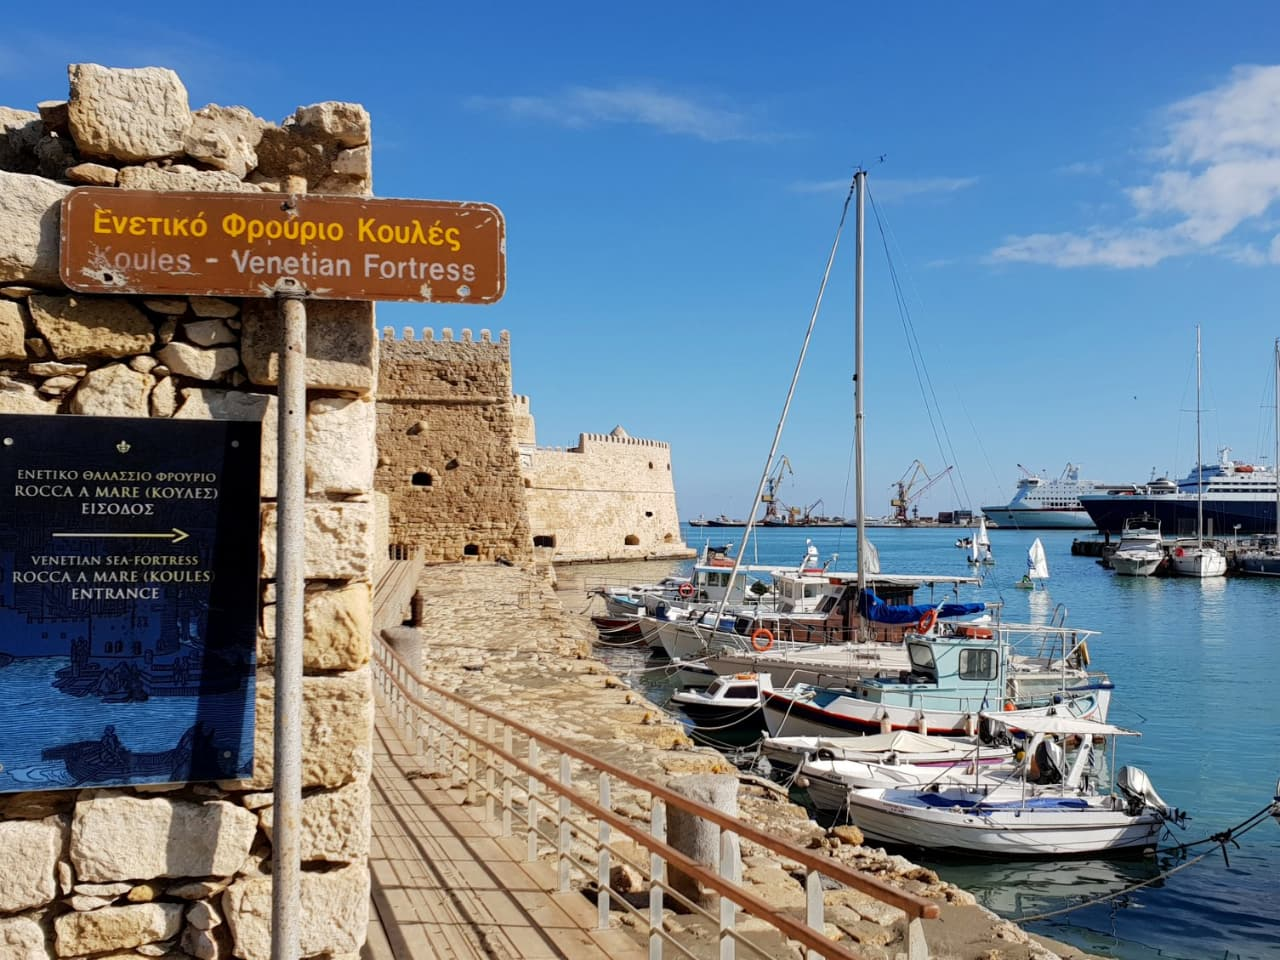 A Tour of the City of Heraklion Crete